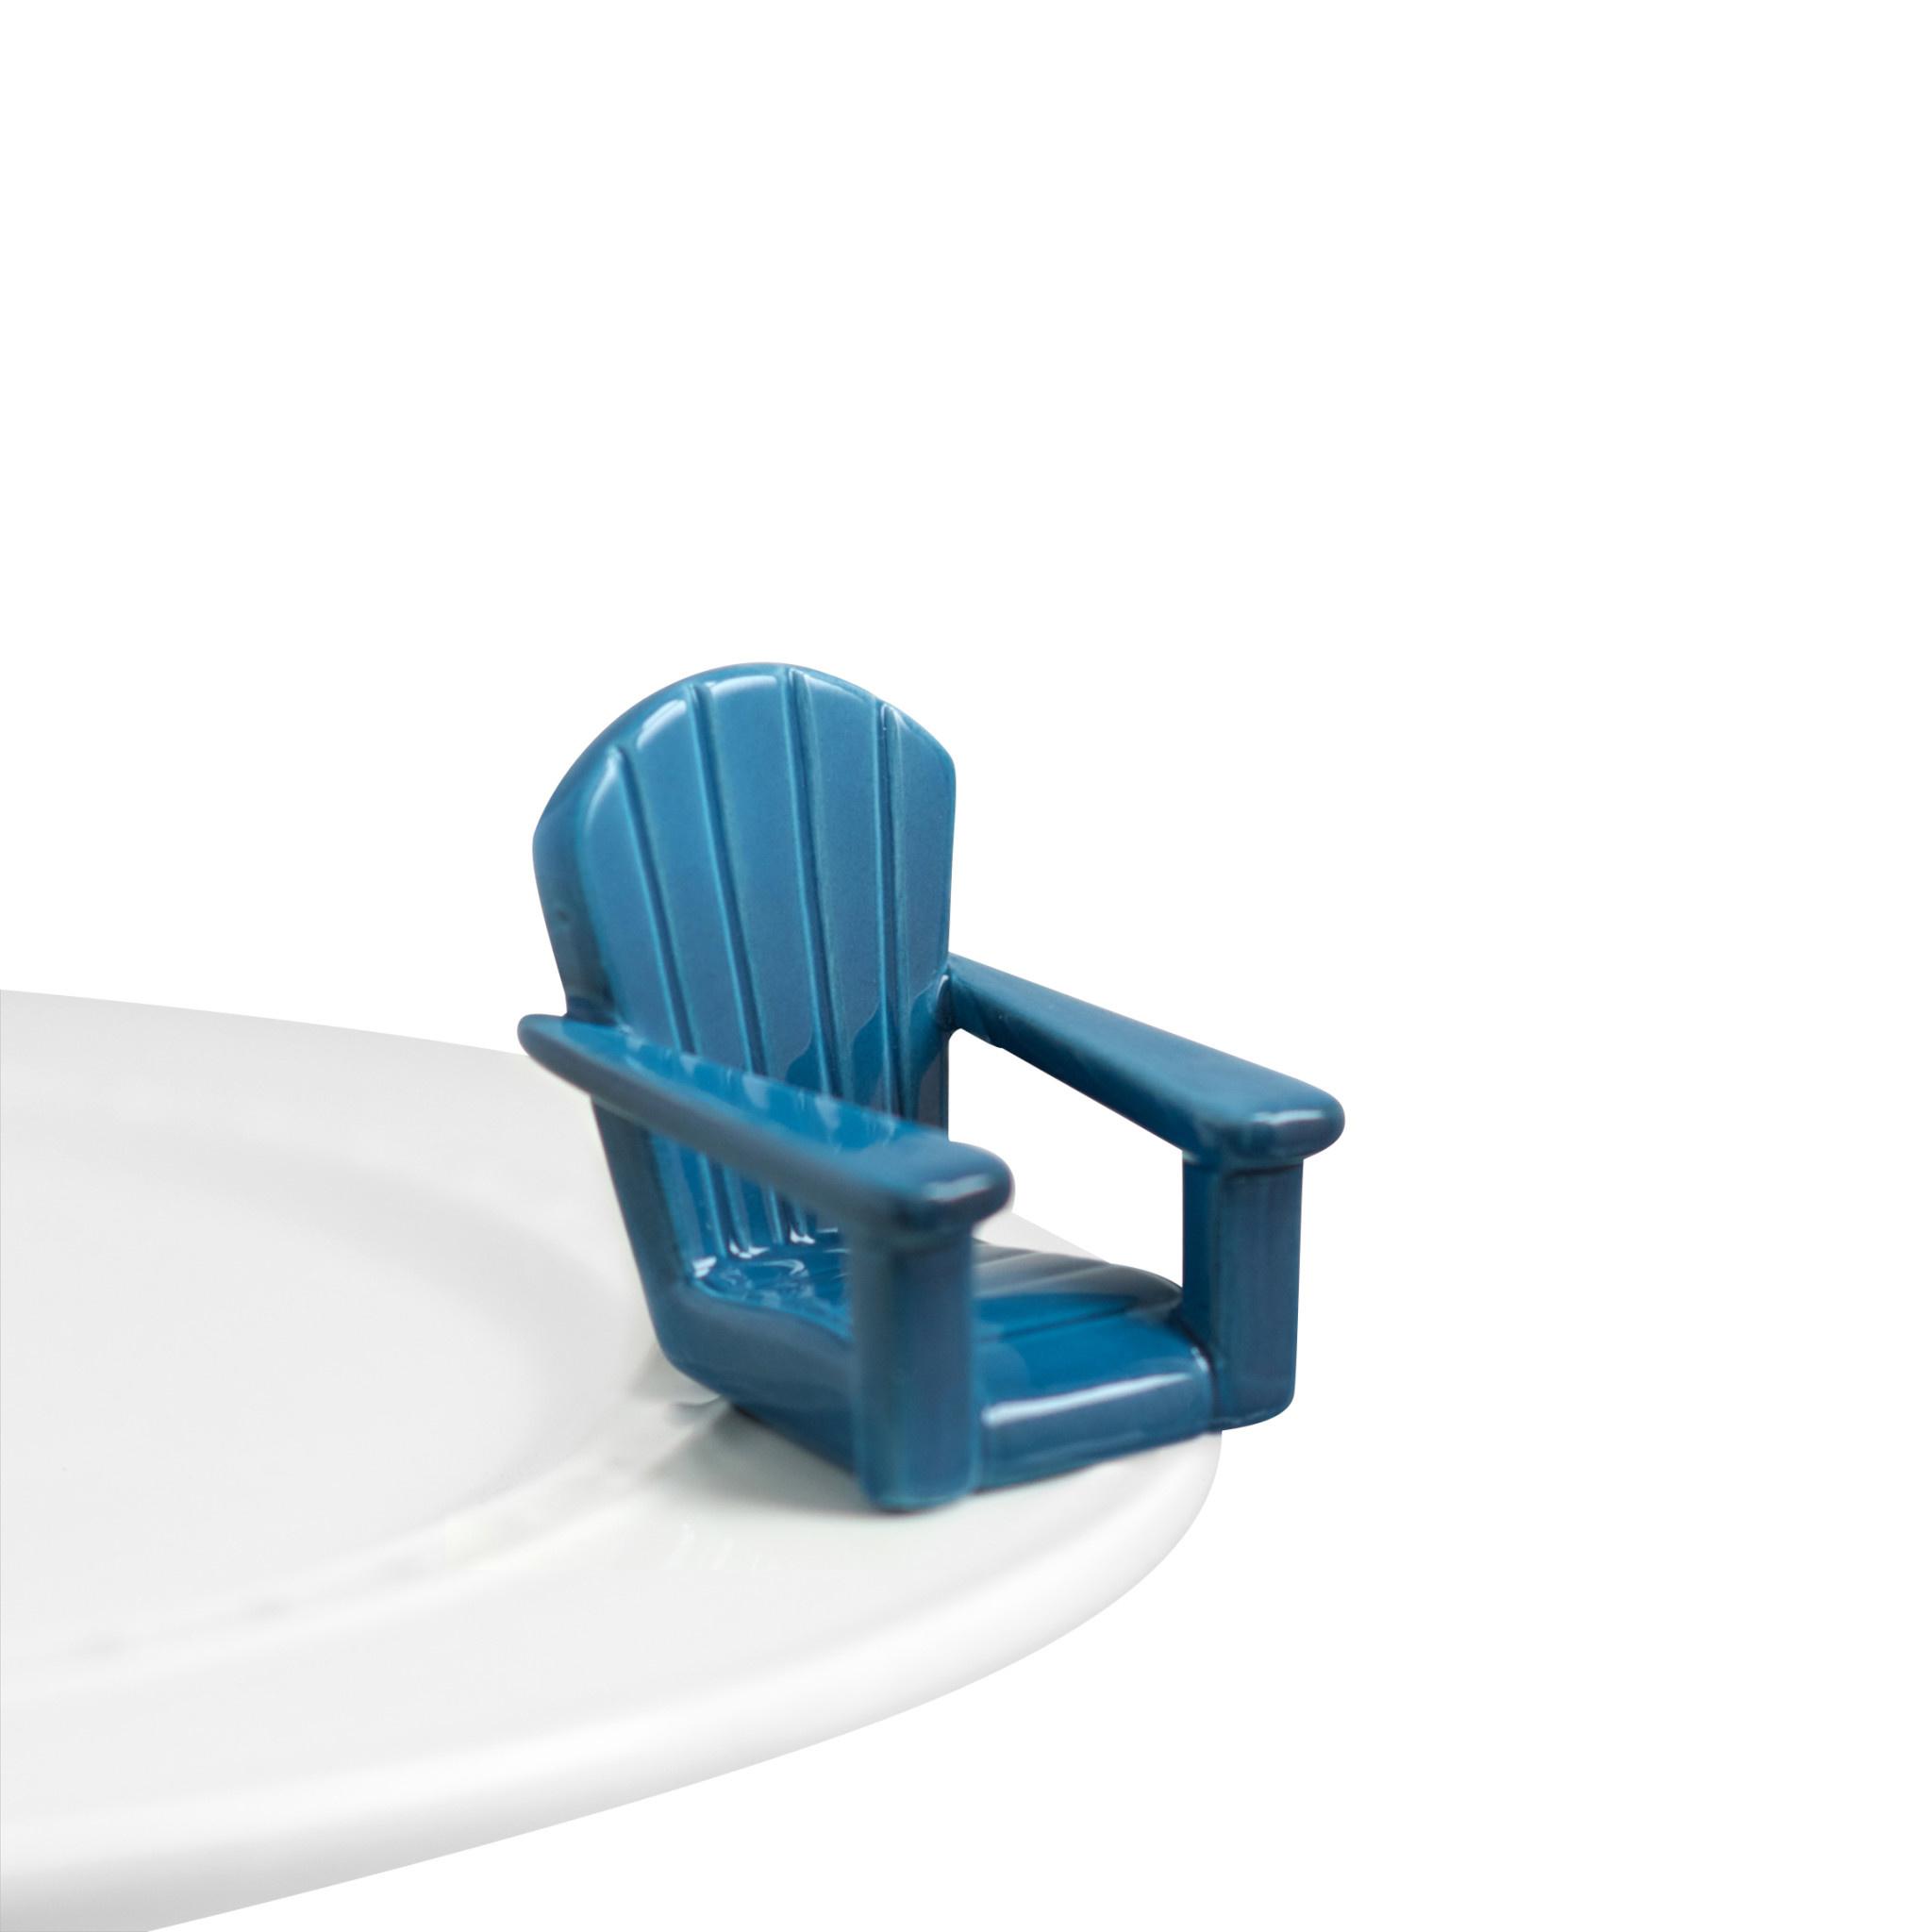 nora fleming chillin' chair blue mini